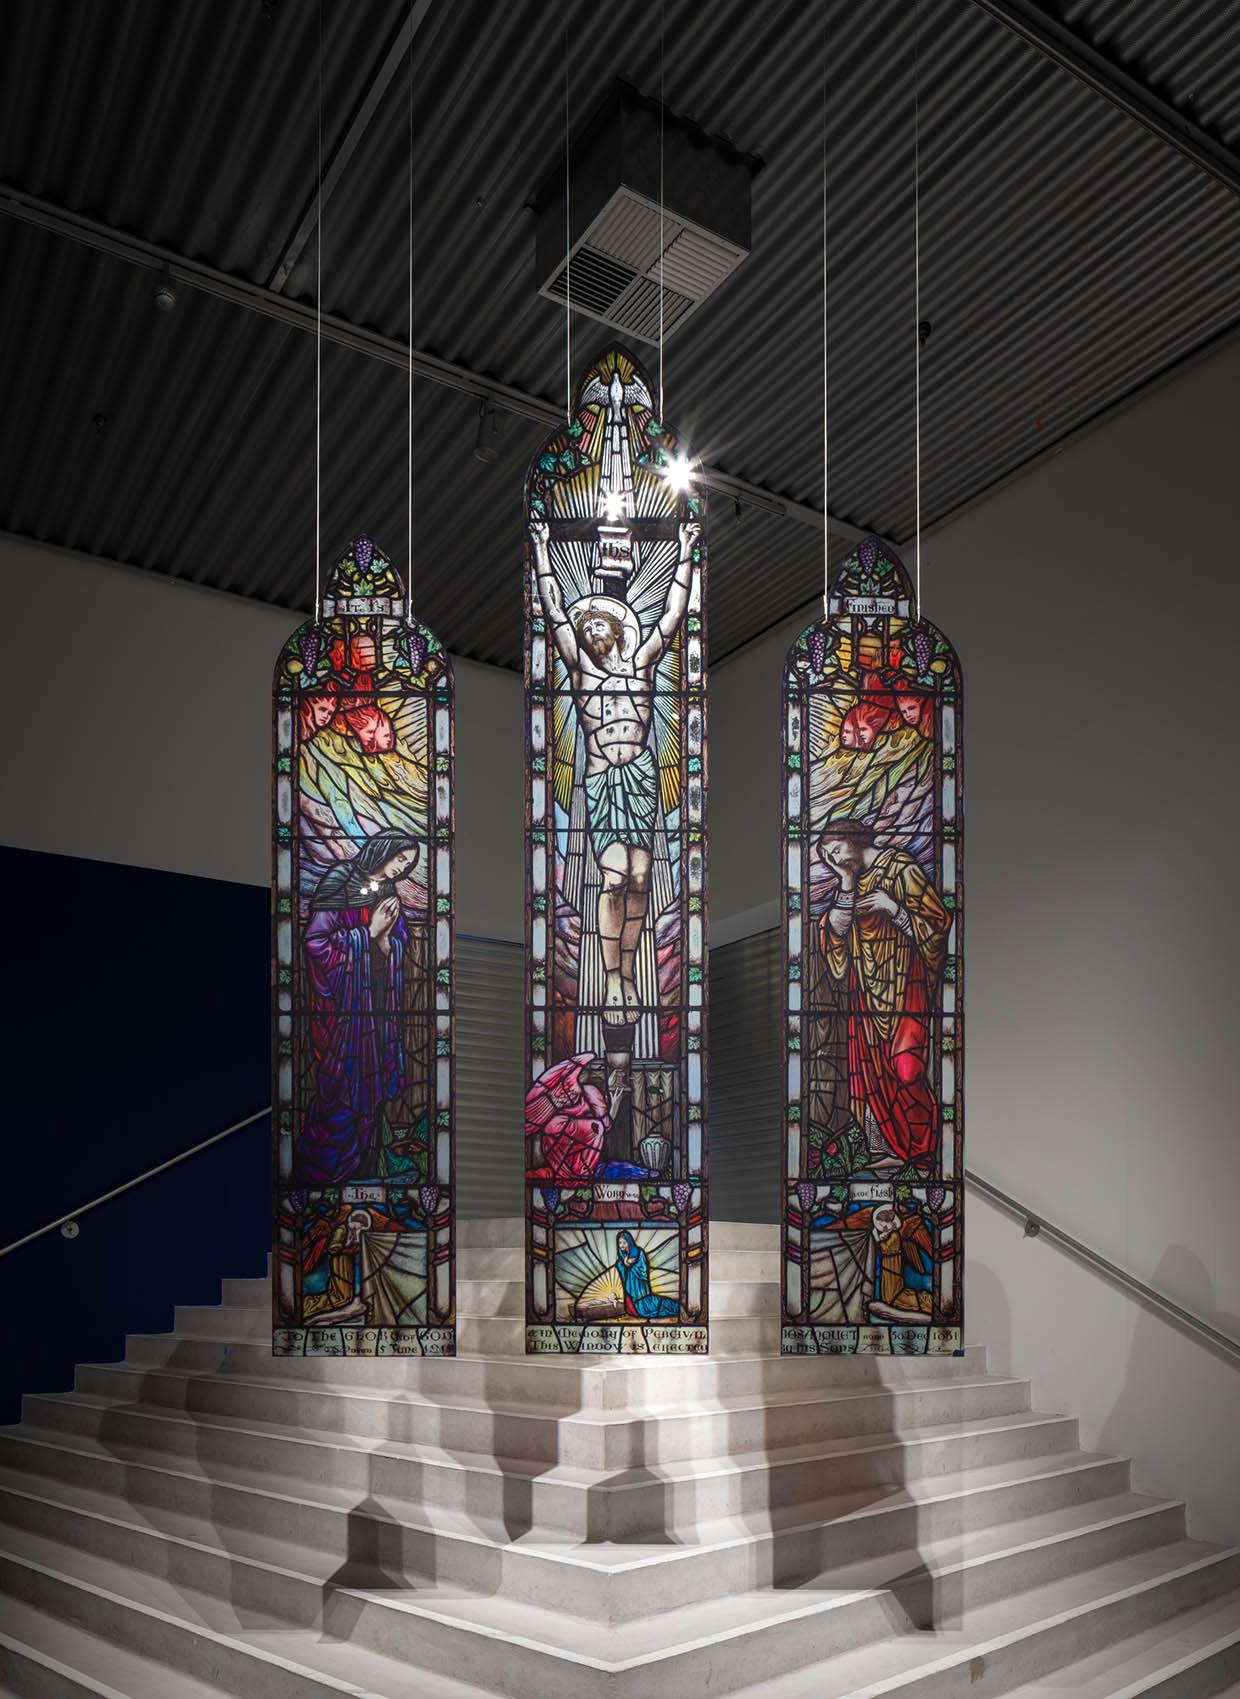 Installationsfoto Baron Rosenkrantz - Farvernes mystik. Foto: David Stjernholm